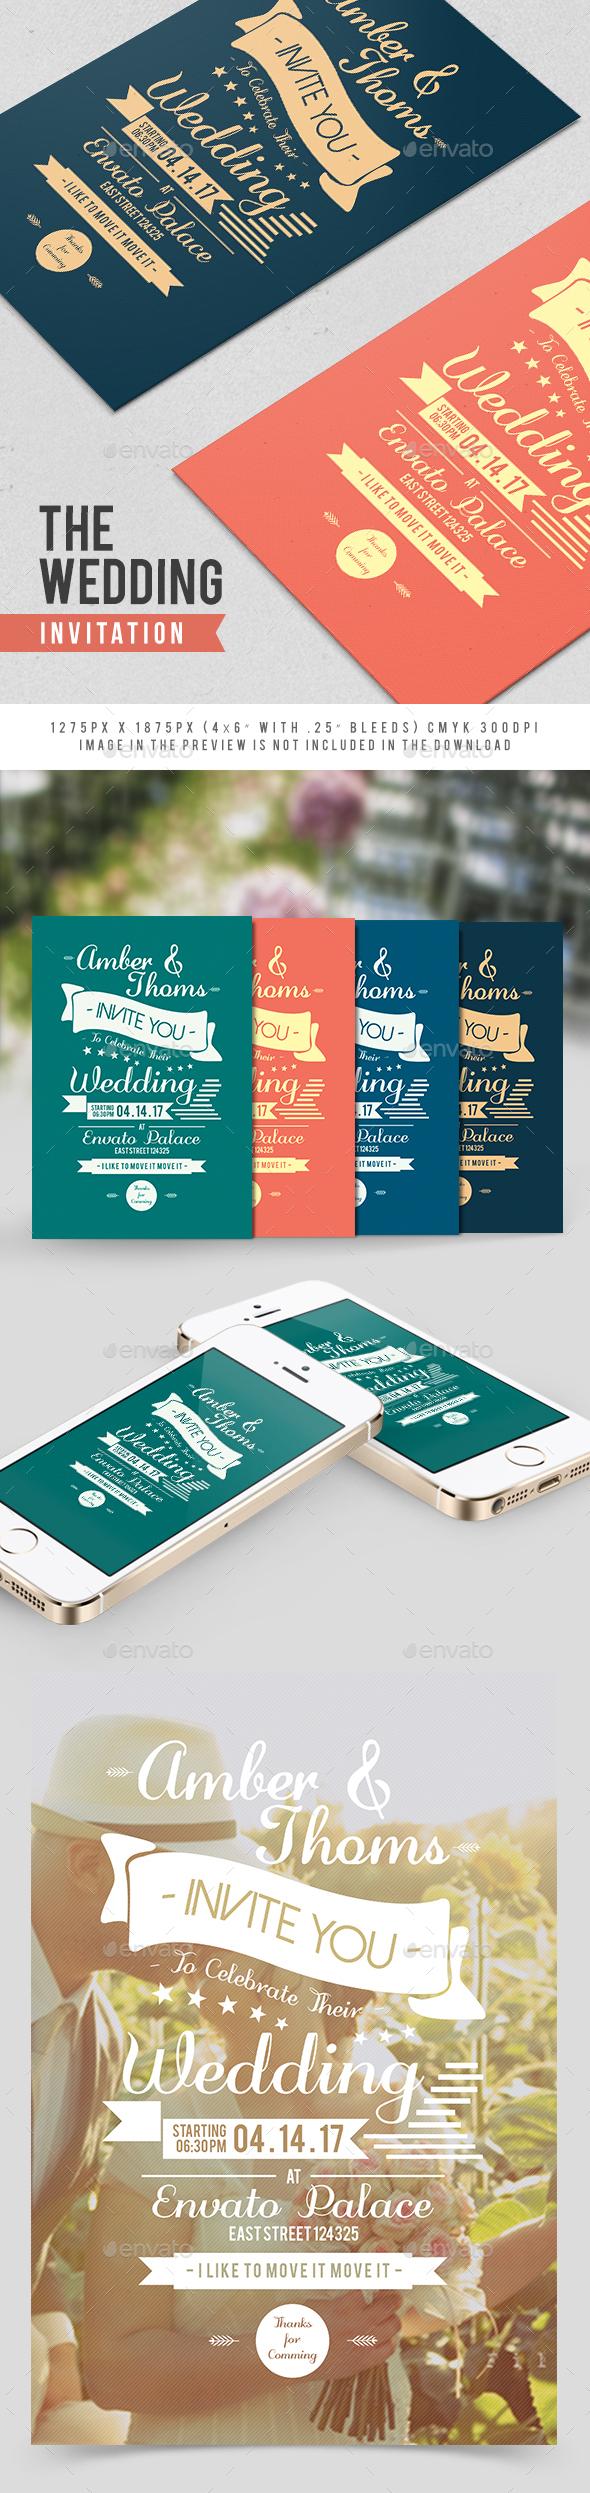 The Wedding Invitation - Weddings Cards & Invites